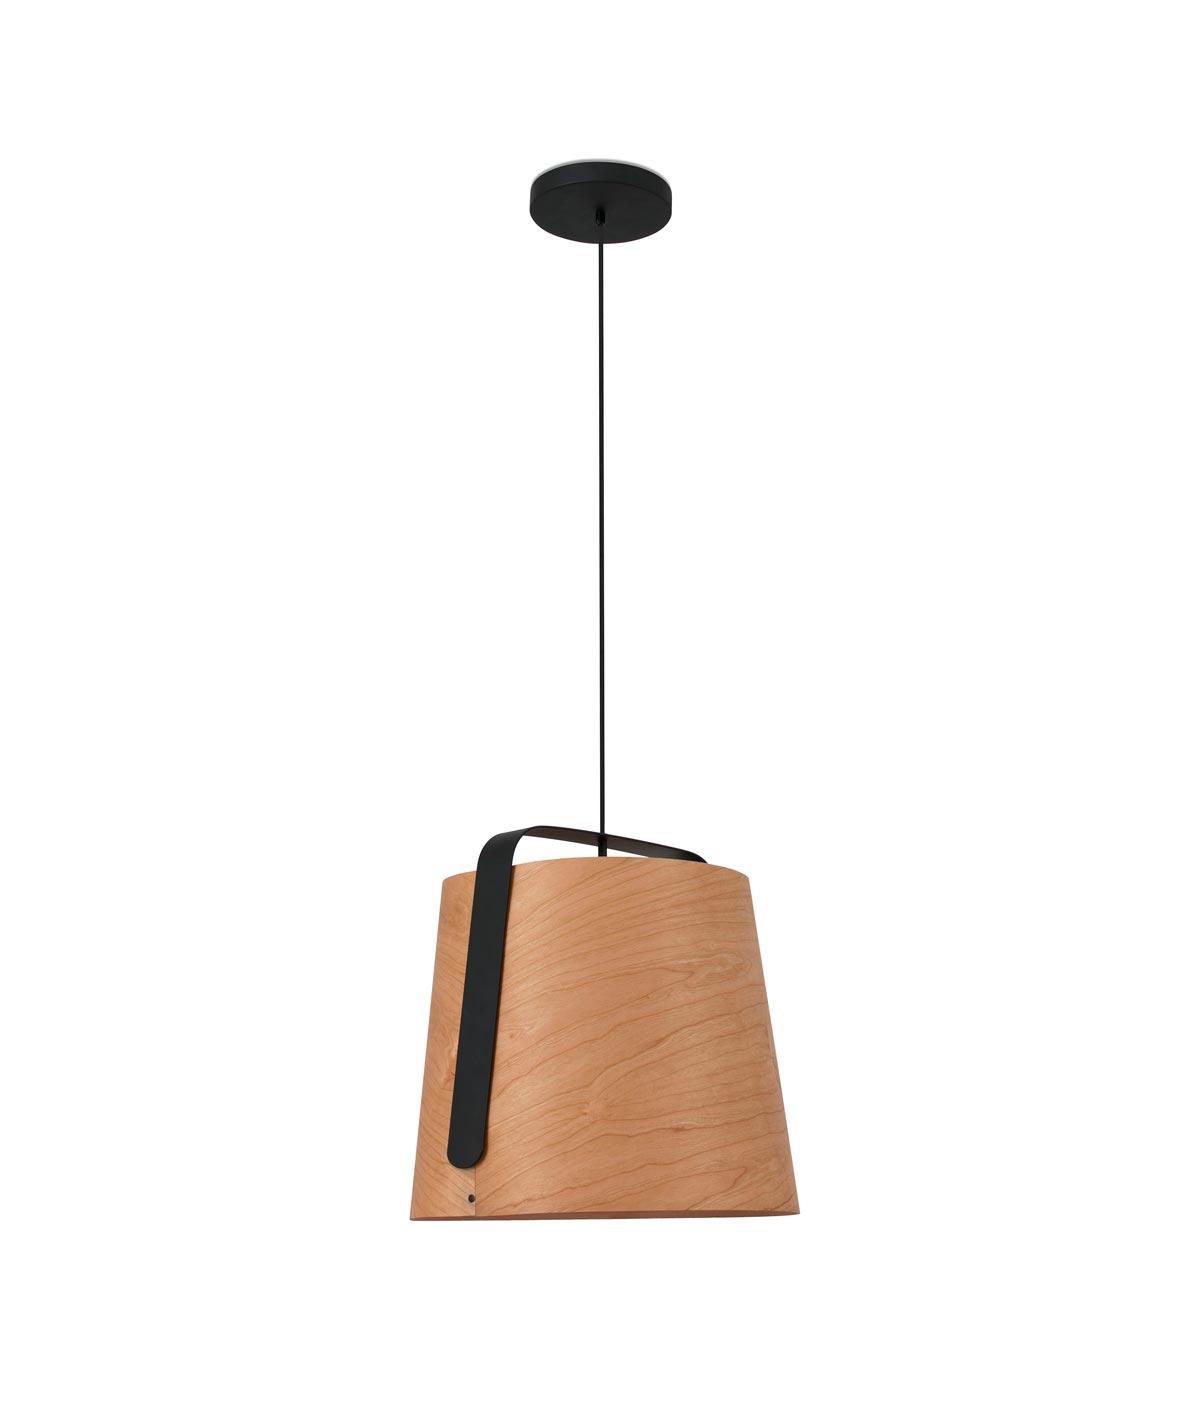 Lámpara comedor madera y negro STOOD